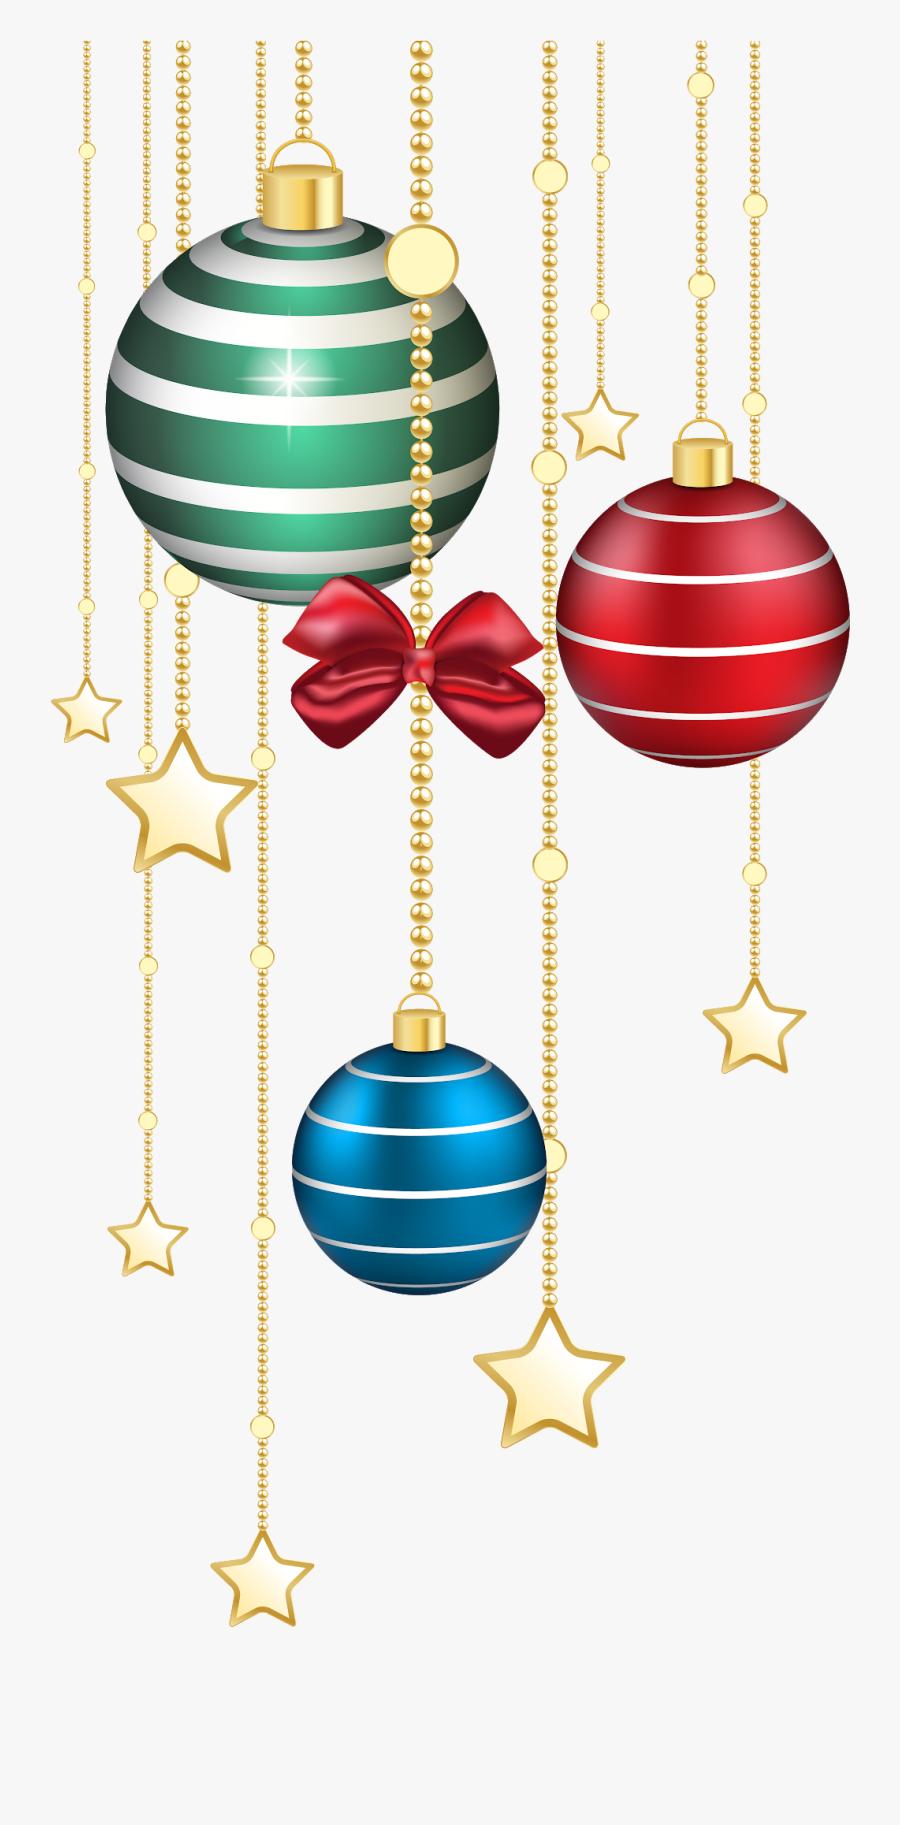 Christmas Clipart, Christmas Balls, Merry Christmas, - Free Christmas Clipart Ornaments, Transparent Clipart